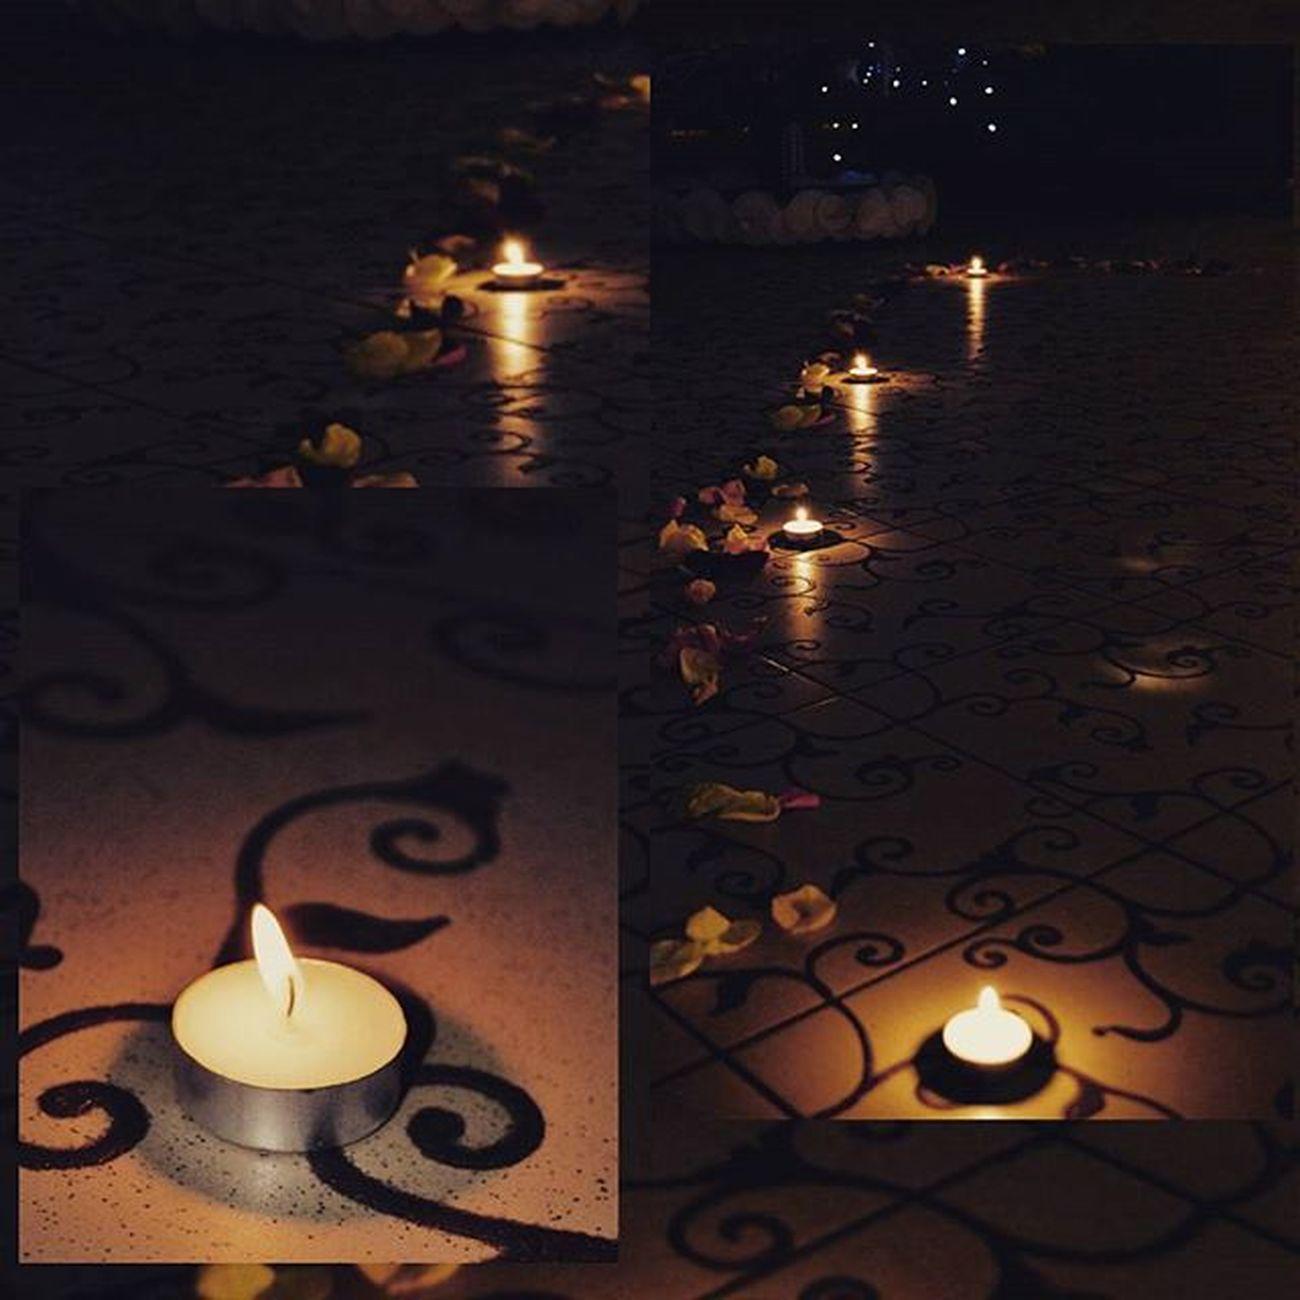 Candles Anasteishaphotos Weddingday  Lights